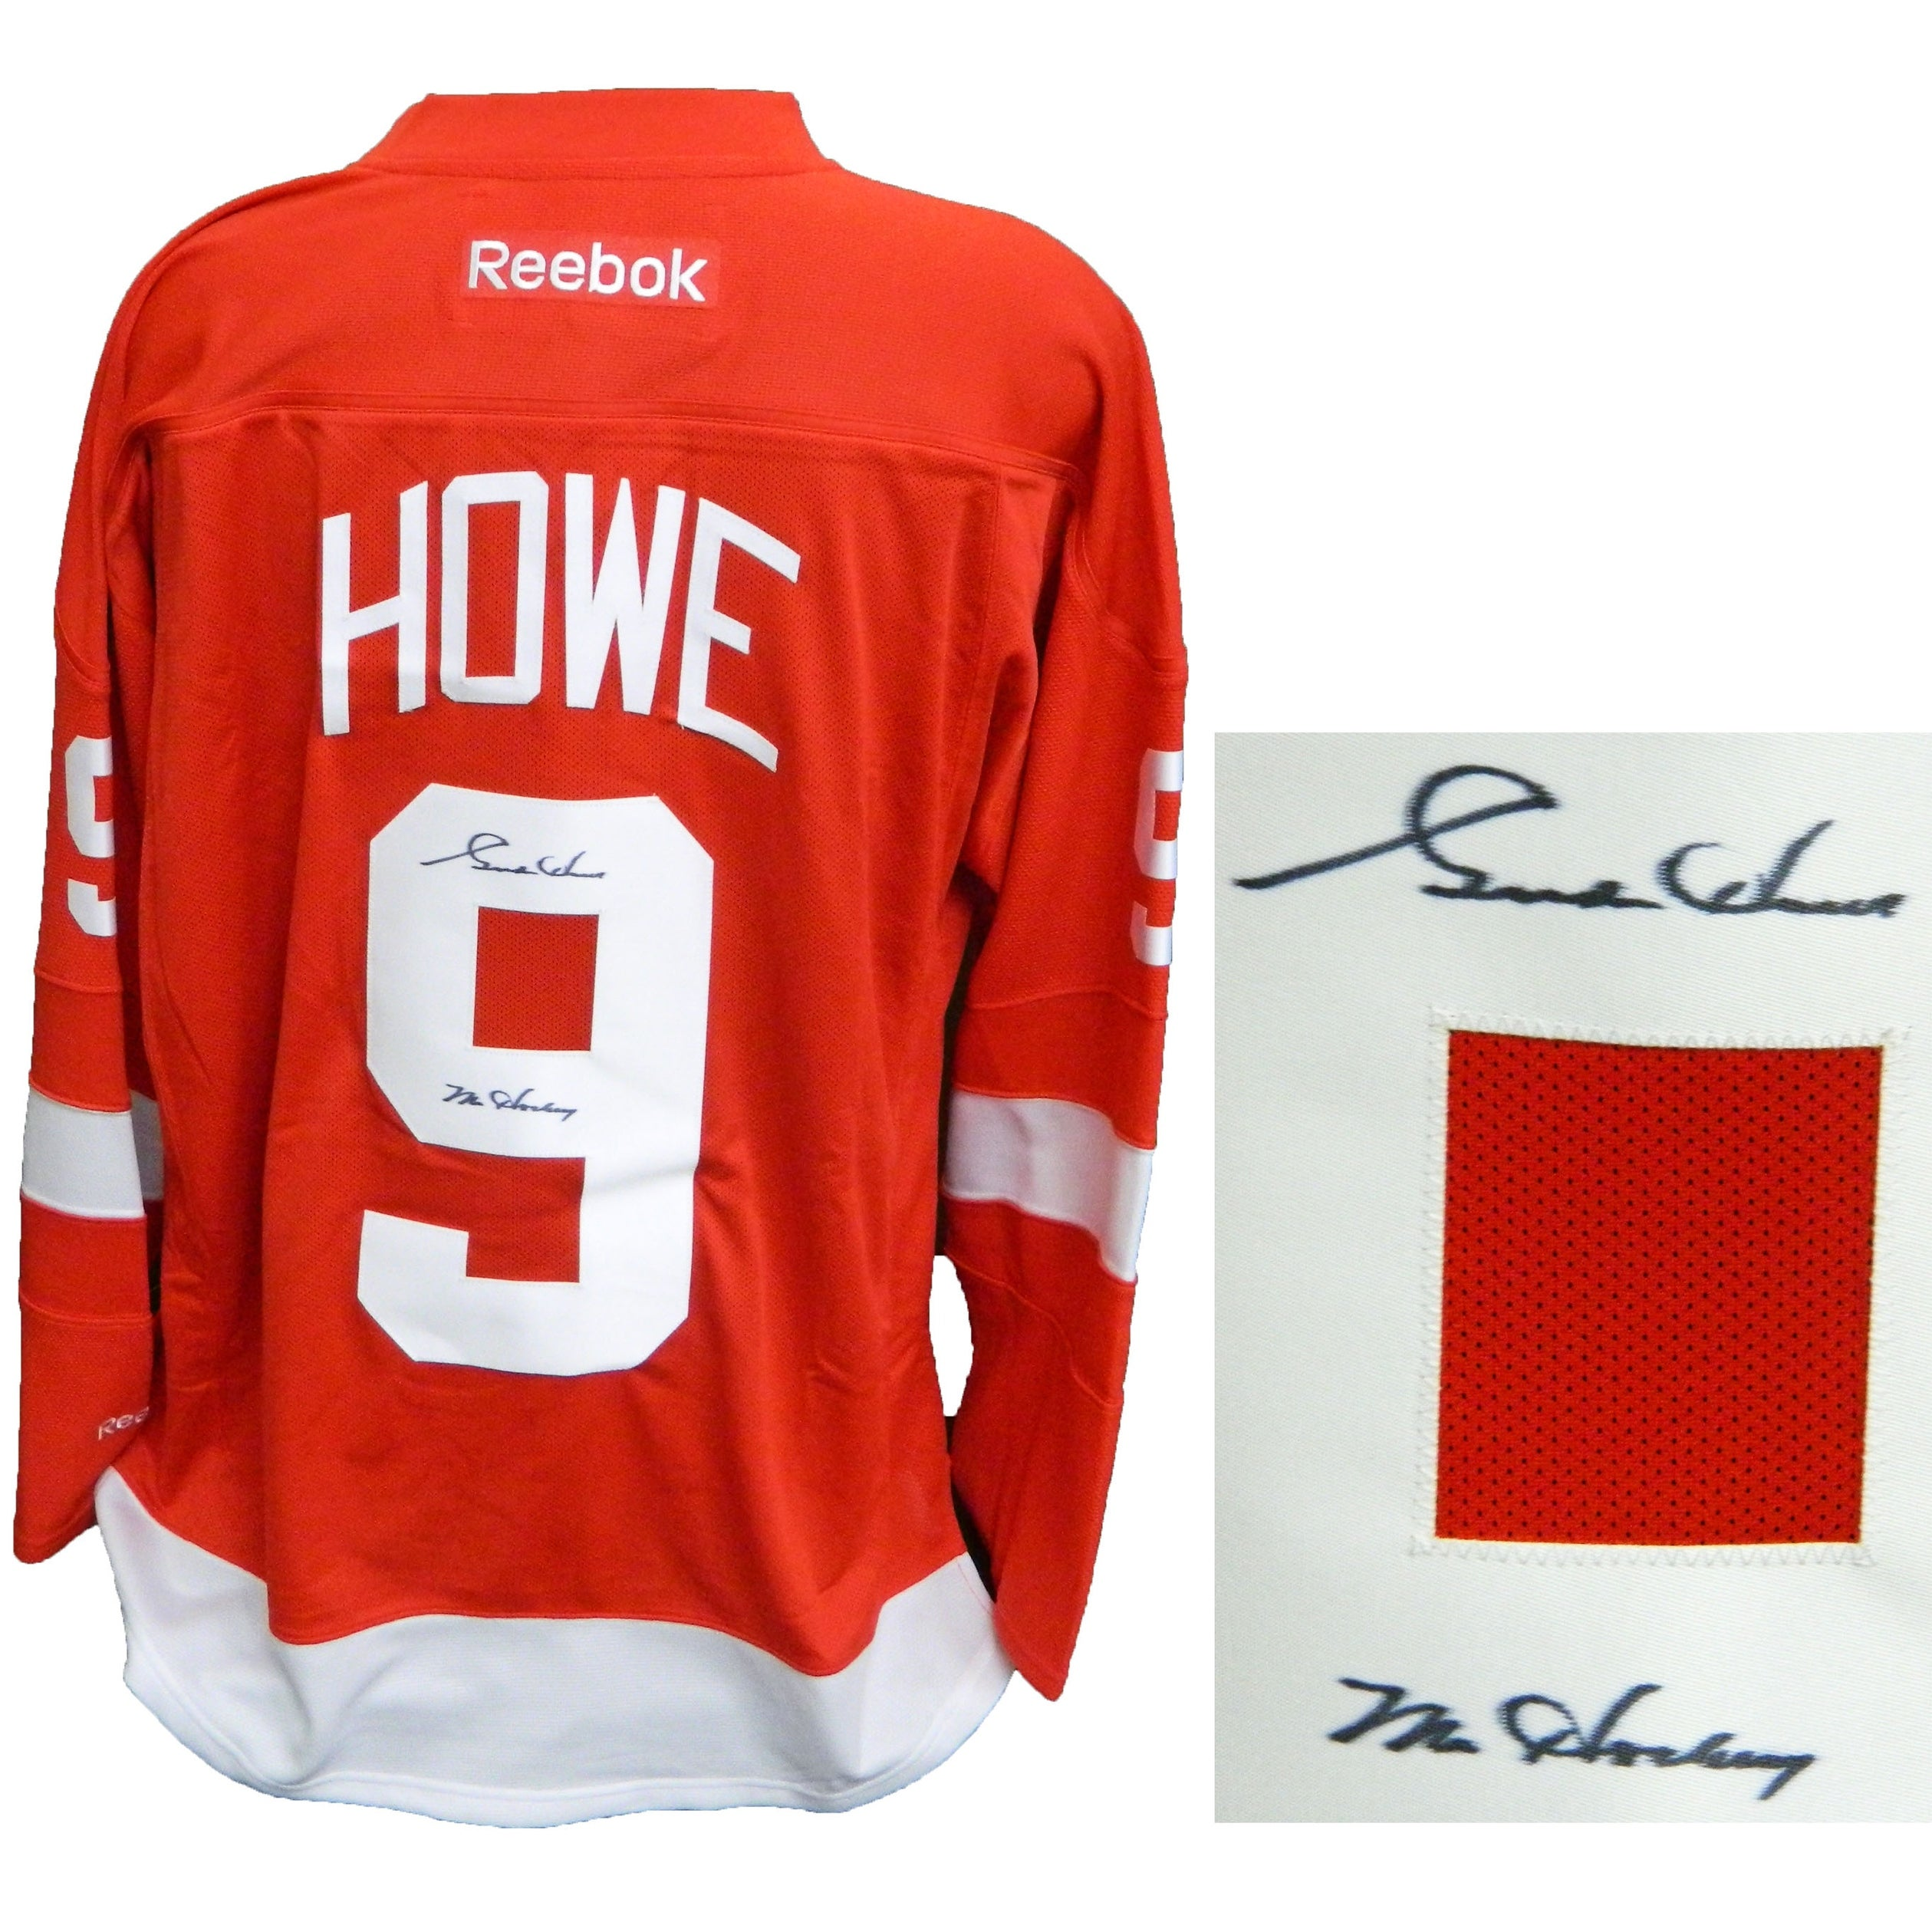 0bd88c6b961 Shop Gordie Howe Detroit Red Wings Red Reebok Premier Hockey Jersey wMr  Hockey - Free Shipping Today - Overstock - 13278248